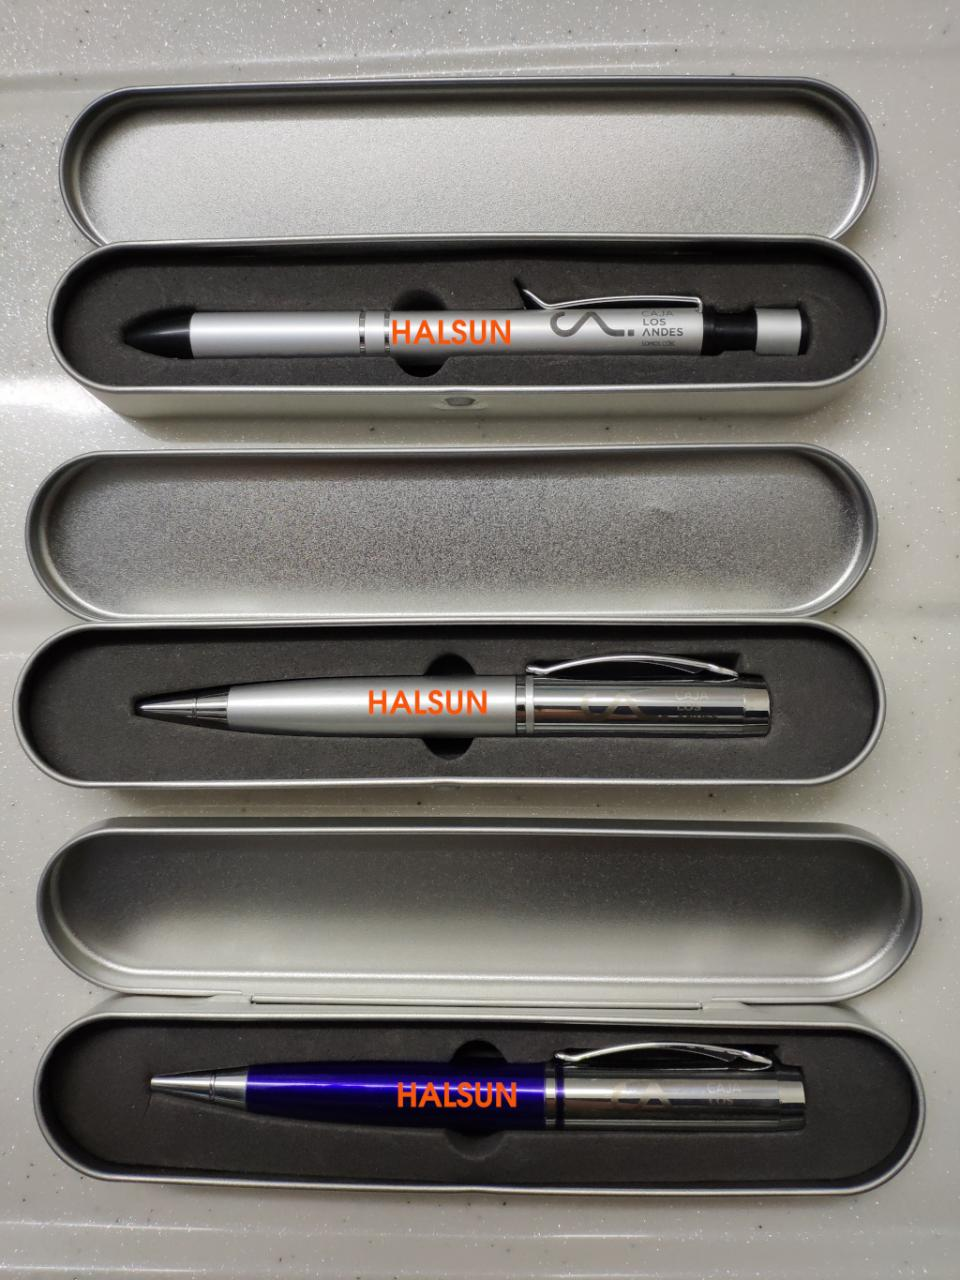 Metal-pens-lager-engraved-CAJA-LOS-ANDES-logo-BKMP-2-S-BMPM-2-B-BKBP-2.jpg